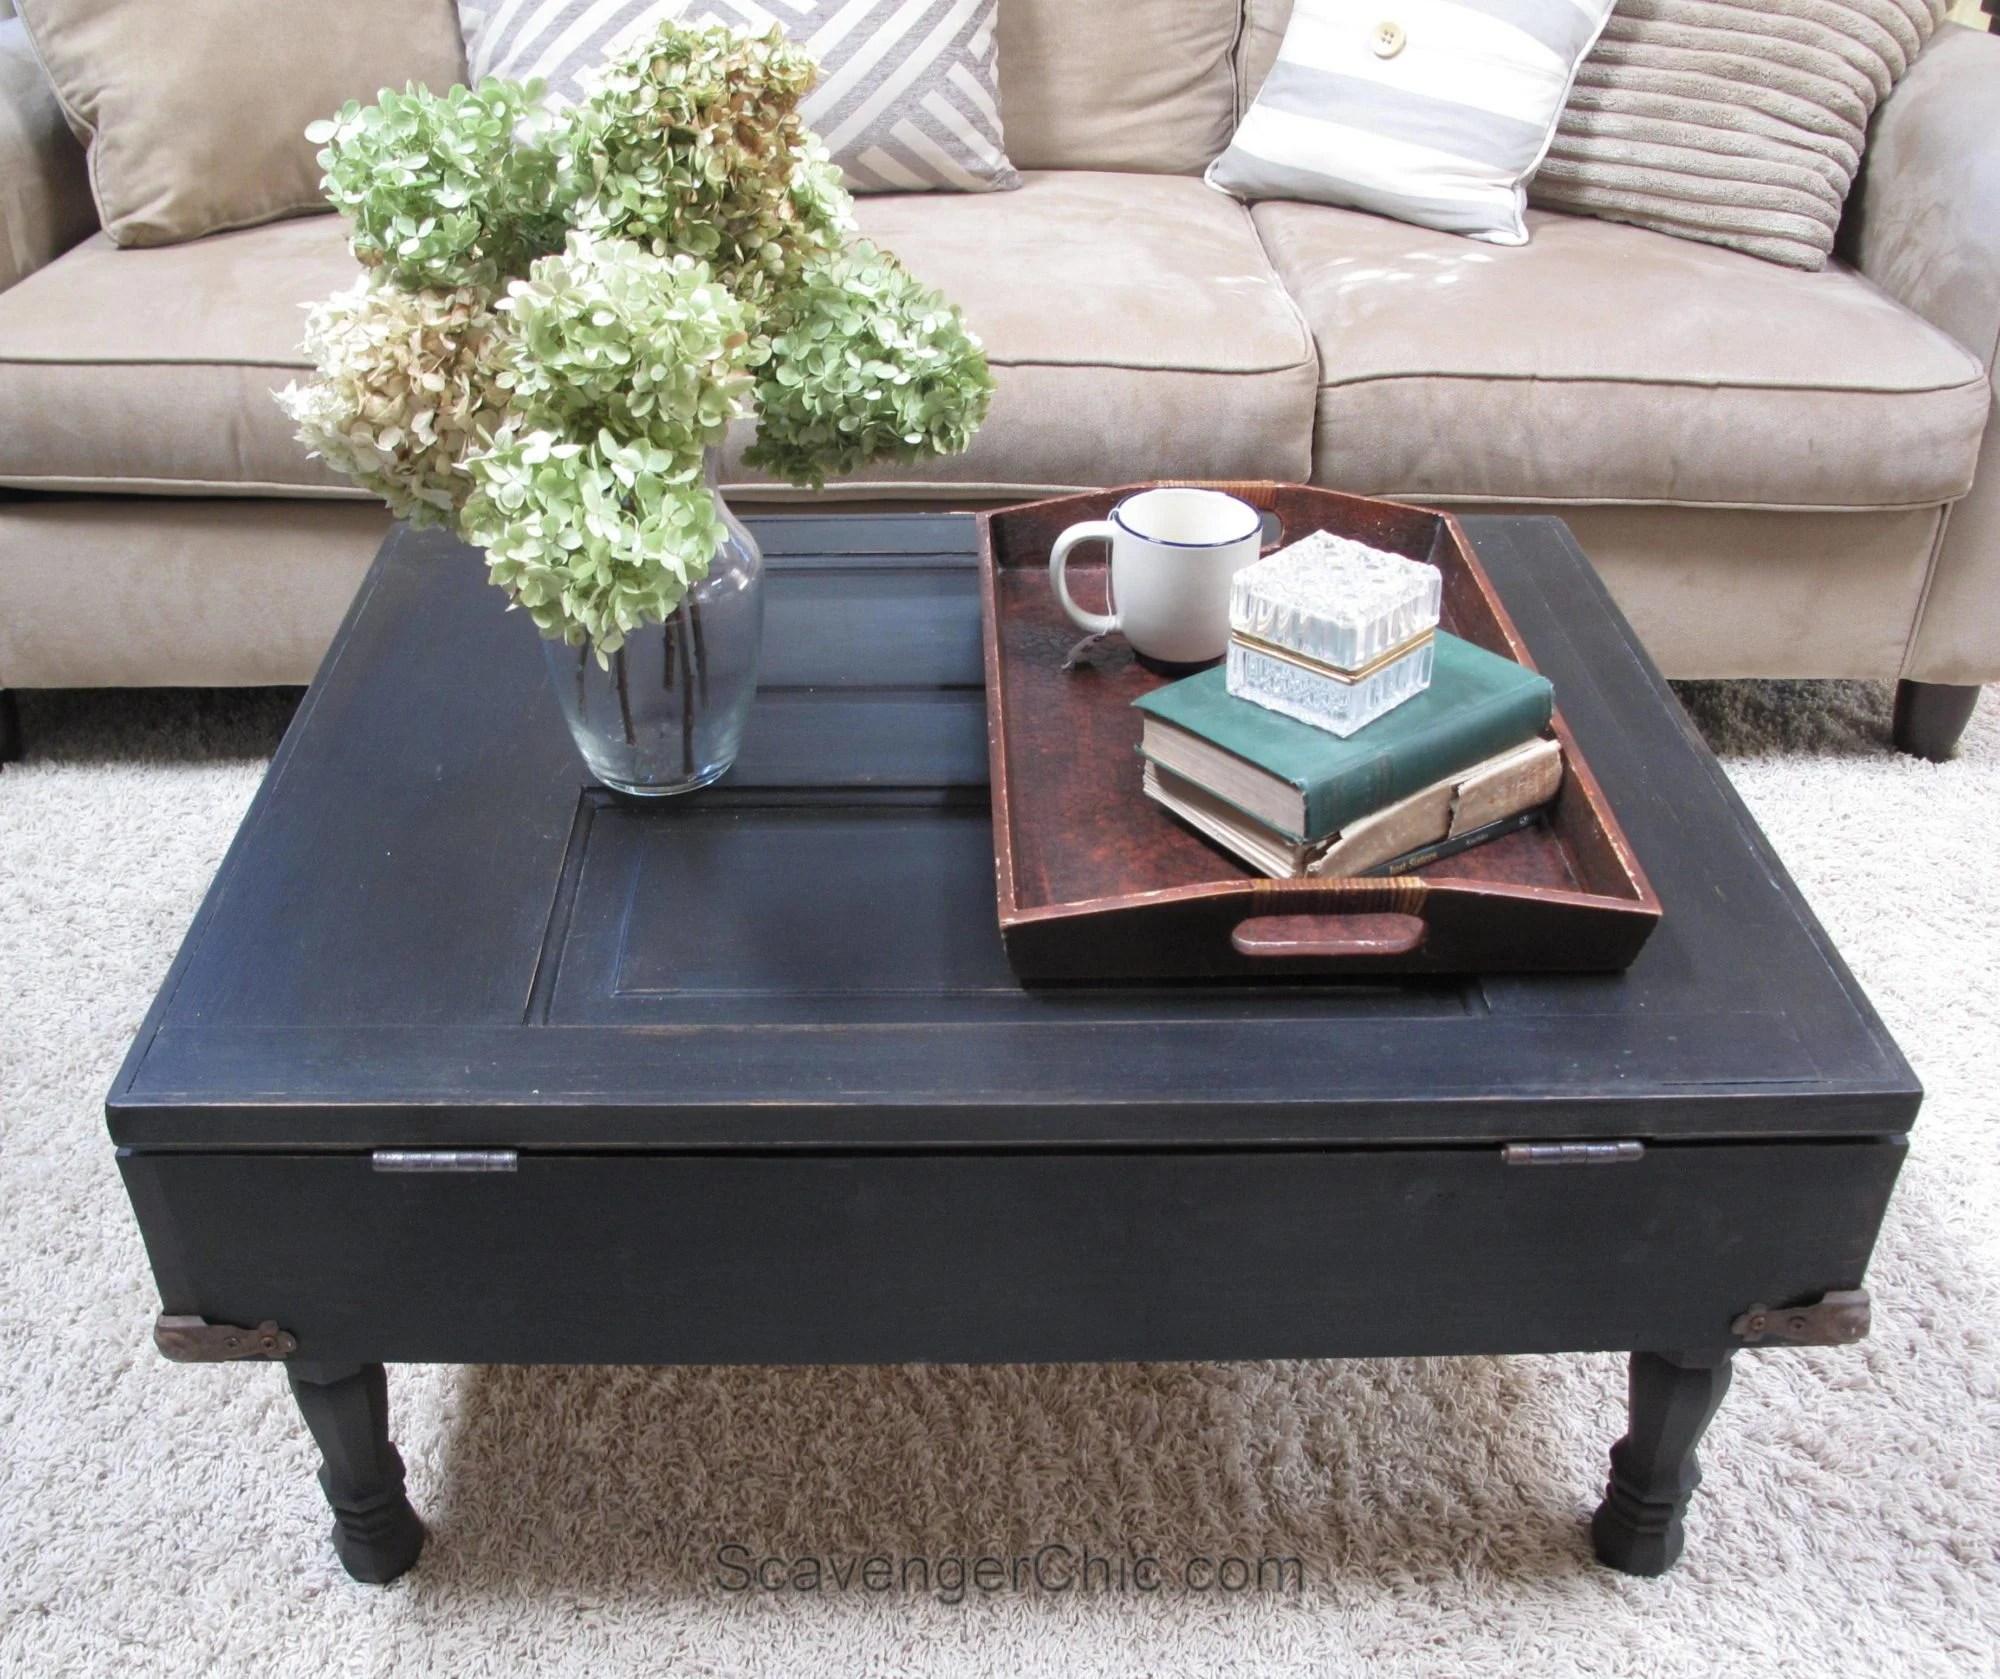 Vintage Door Coffee Table diy - My Repurposed Life® Rescue ...